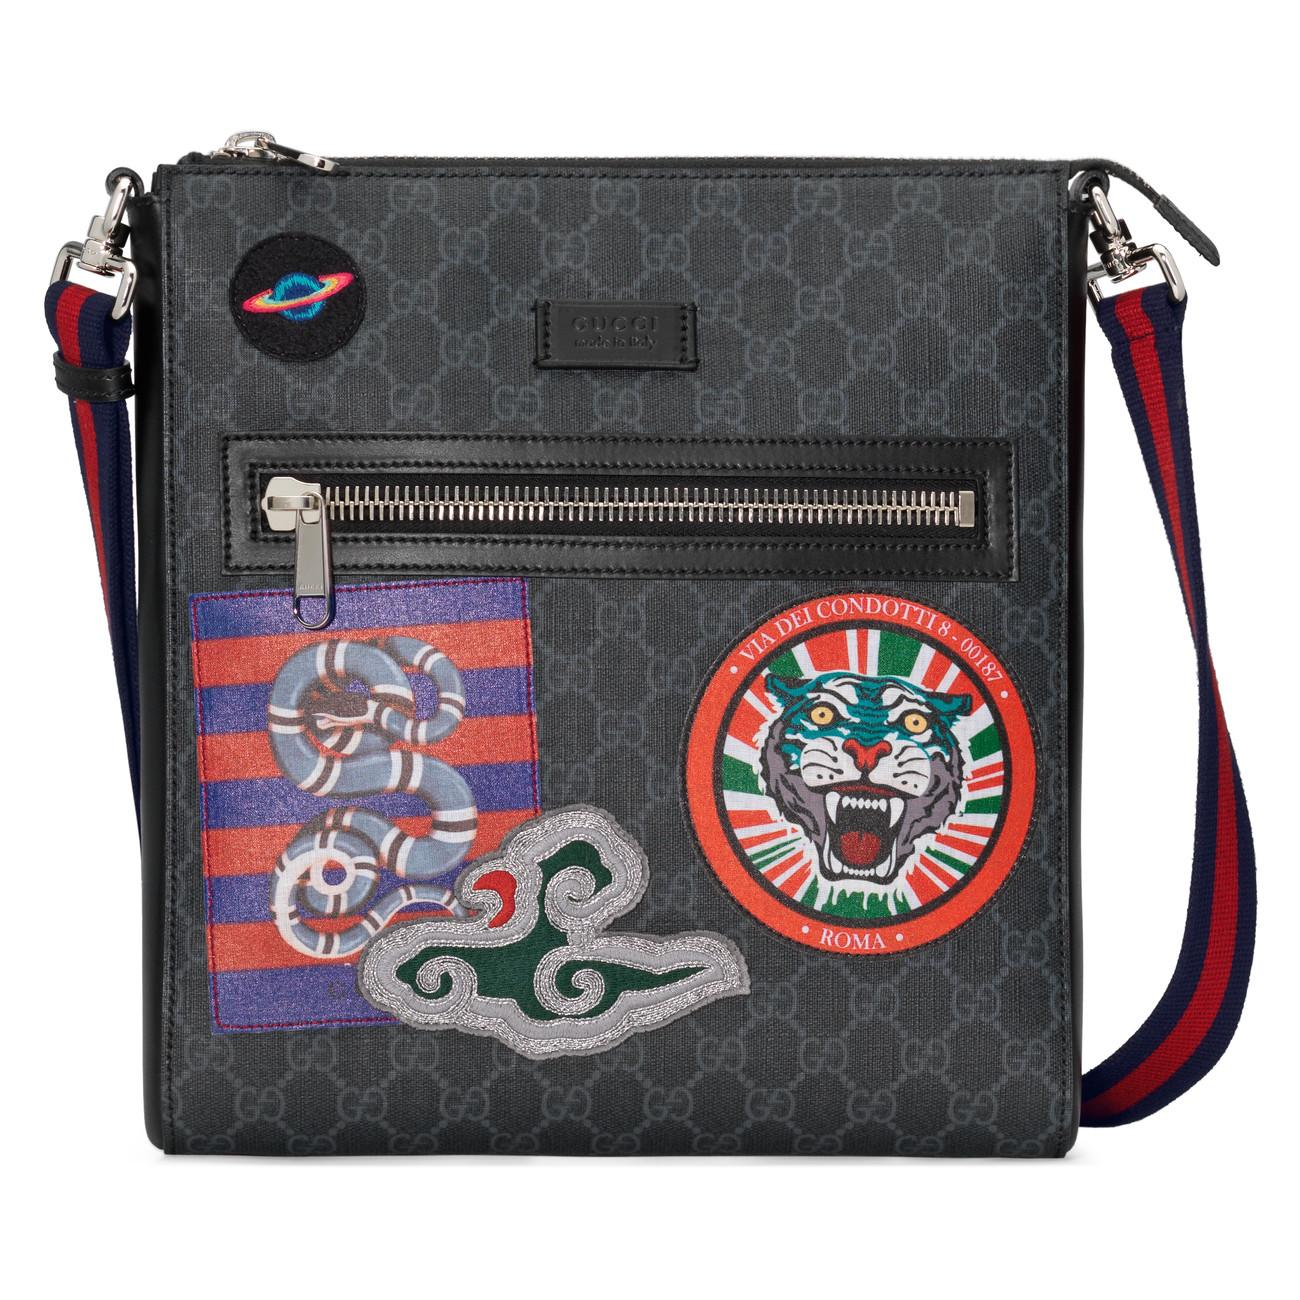 e233fa371a3 Lyst - Gucci Night Courrier GG Supreme Messenger for Men - Save 19%